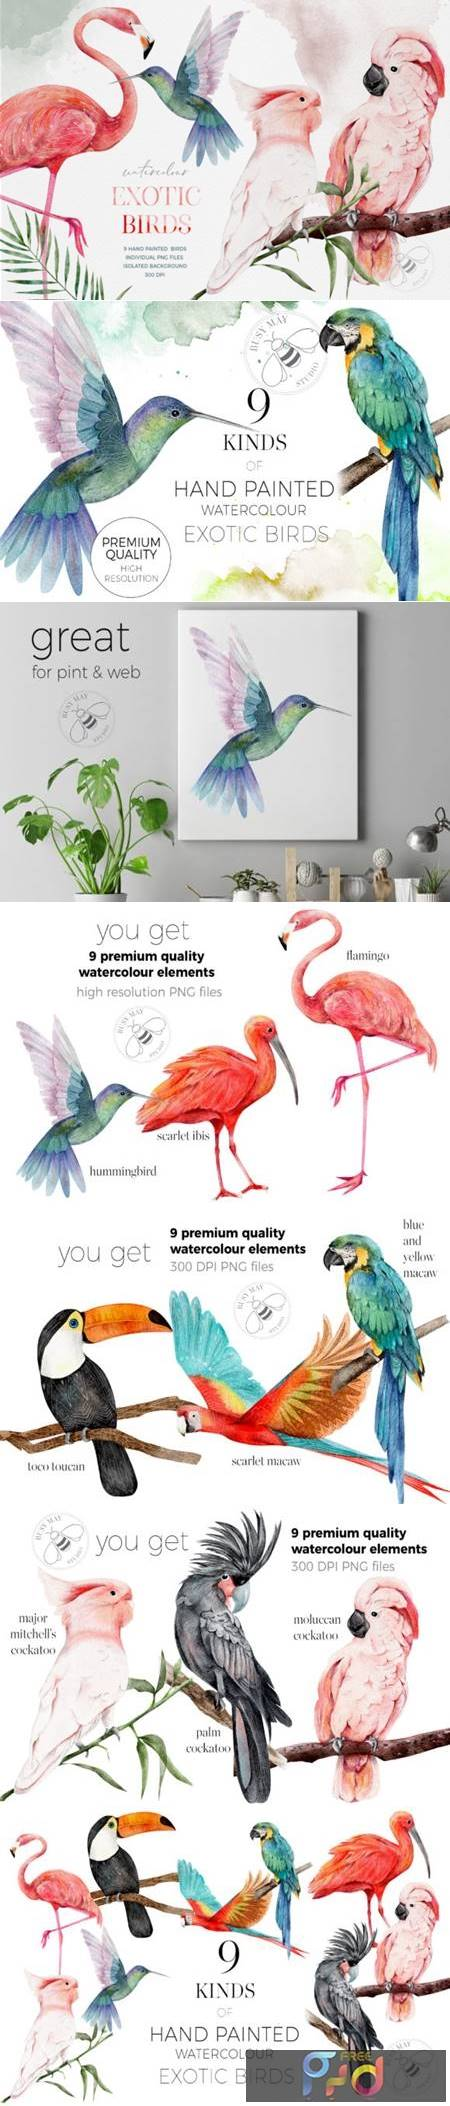 Watercolor Exotic Birds Tropical PNG 6978699 1